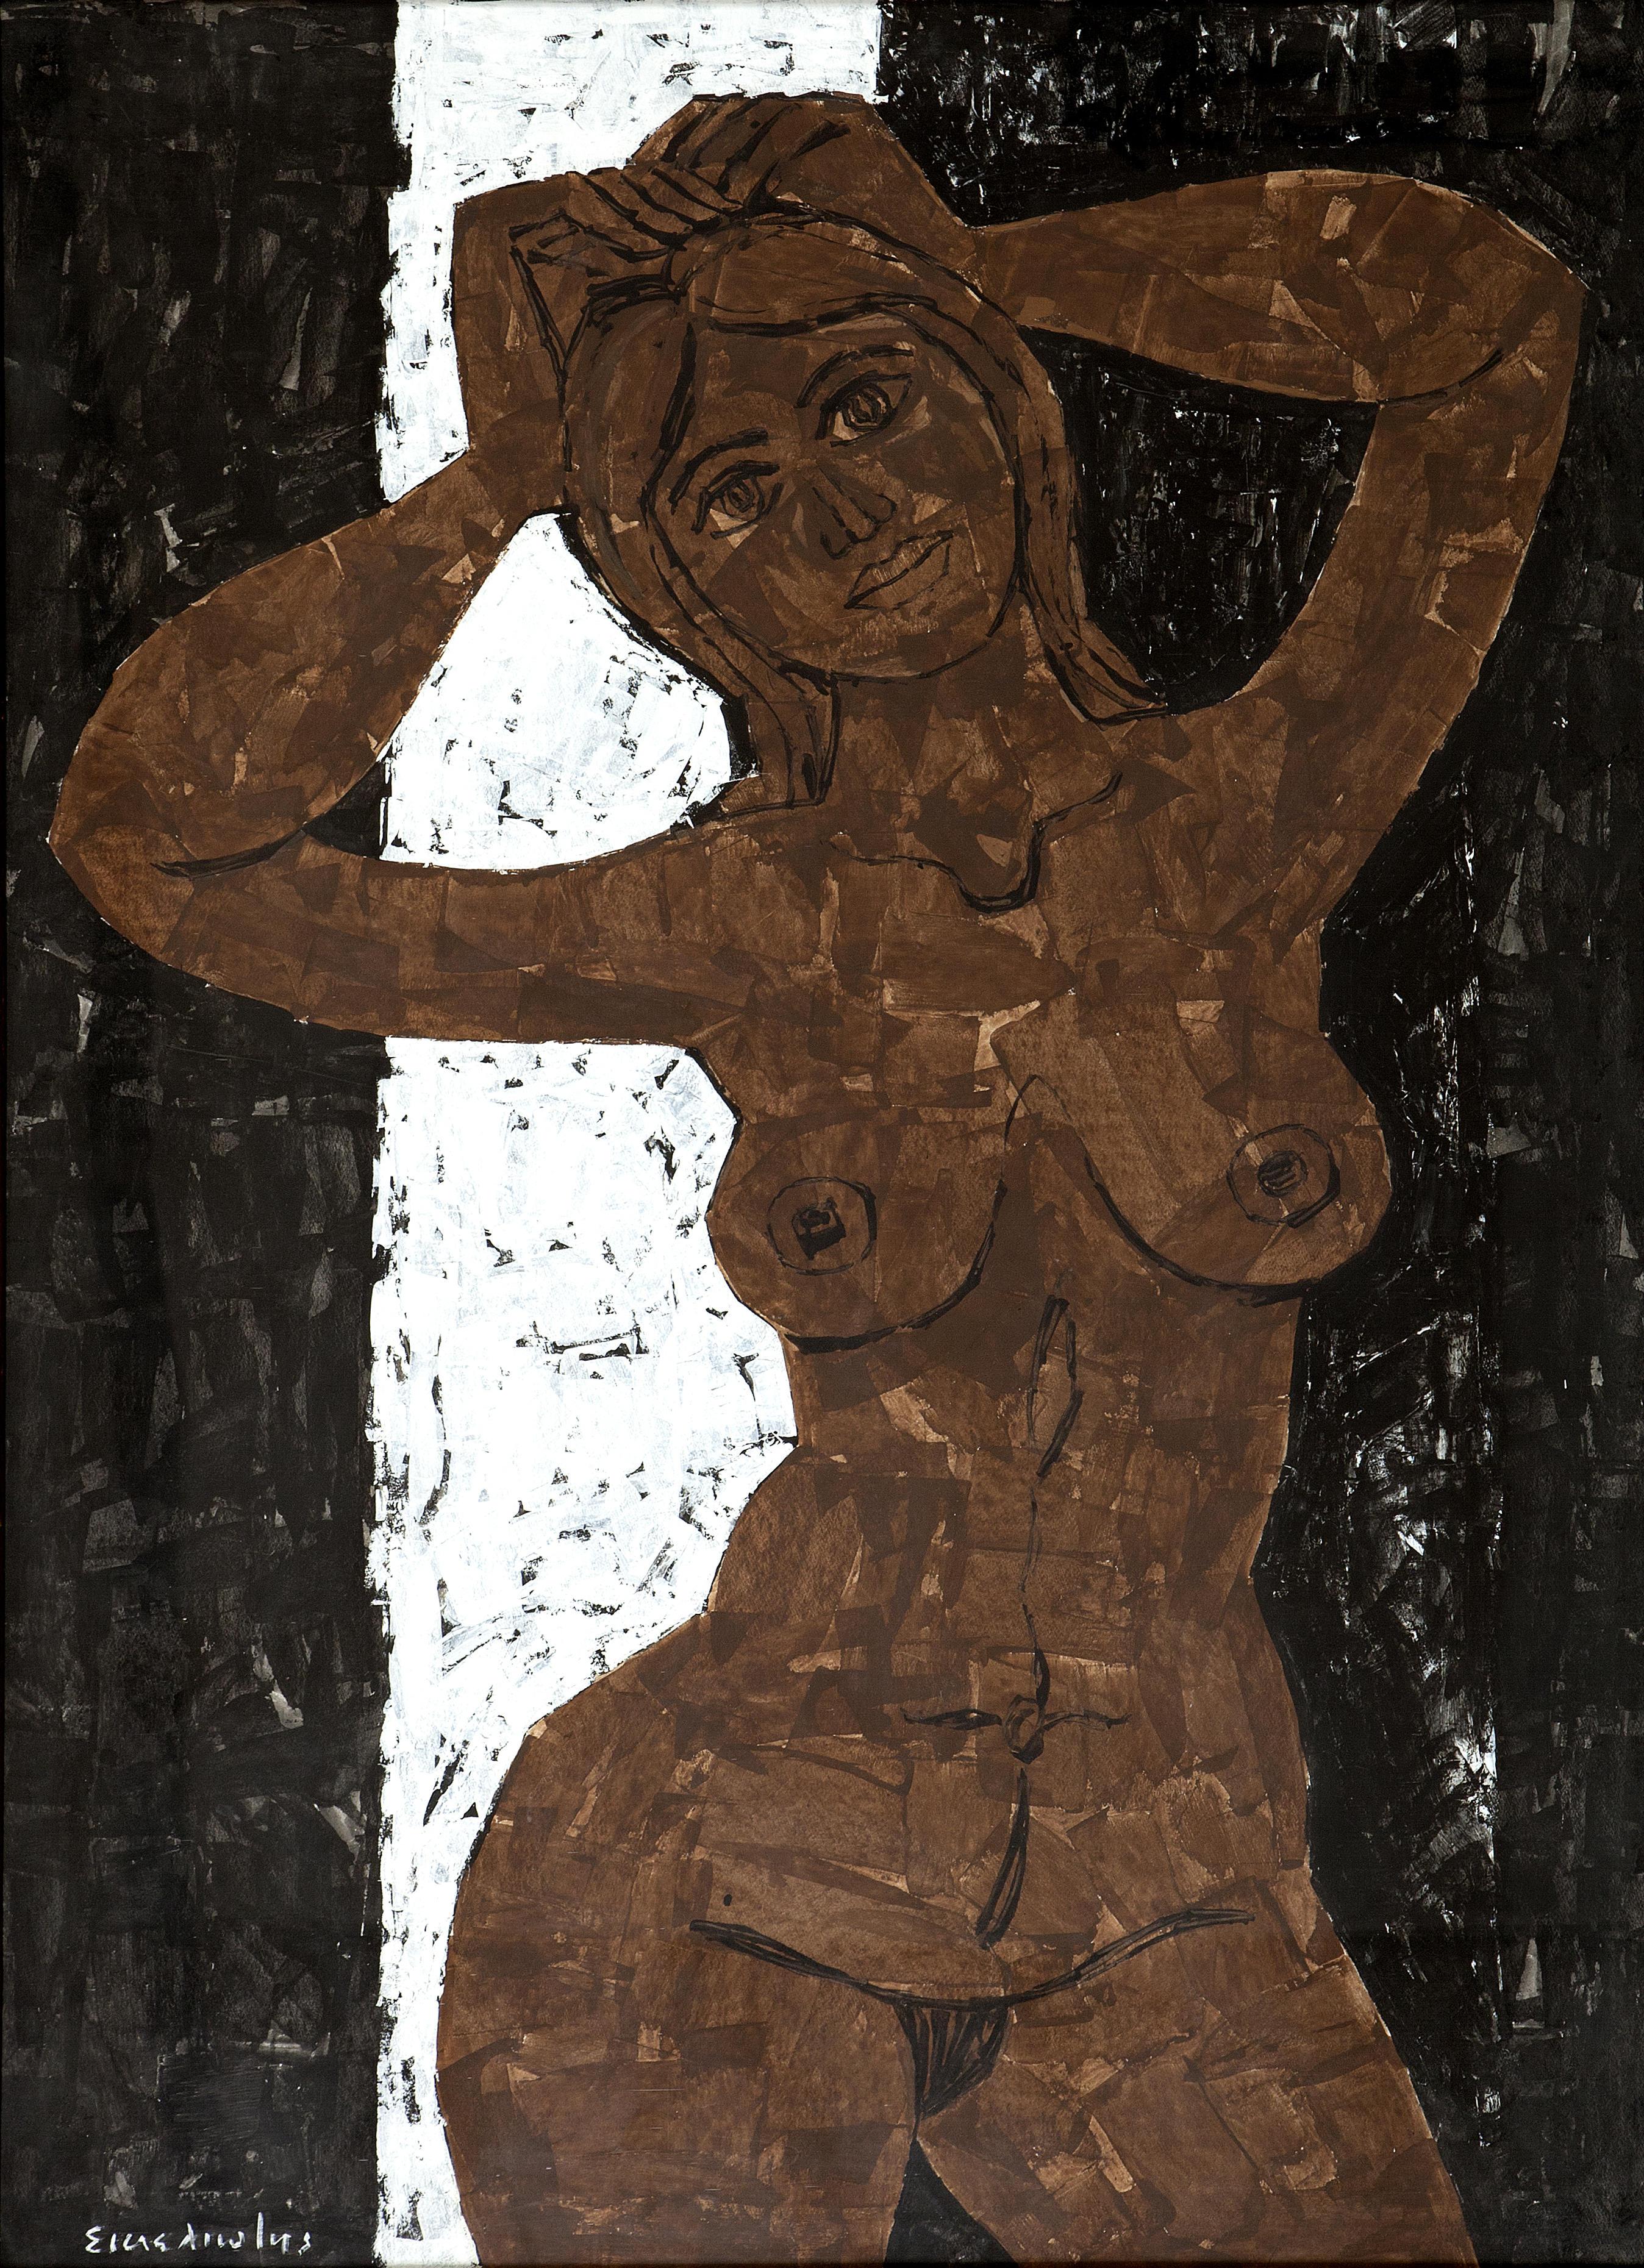 Georgios Sikeliotis, 1917-1984. Обнаженная. 100 x 69 см. Частная коллекция